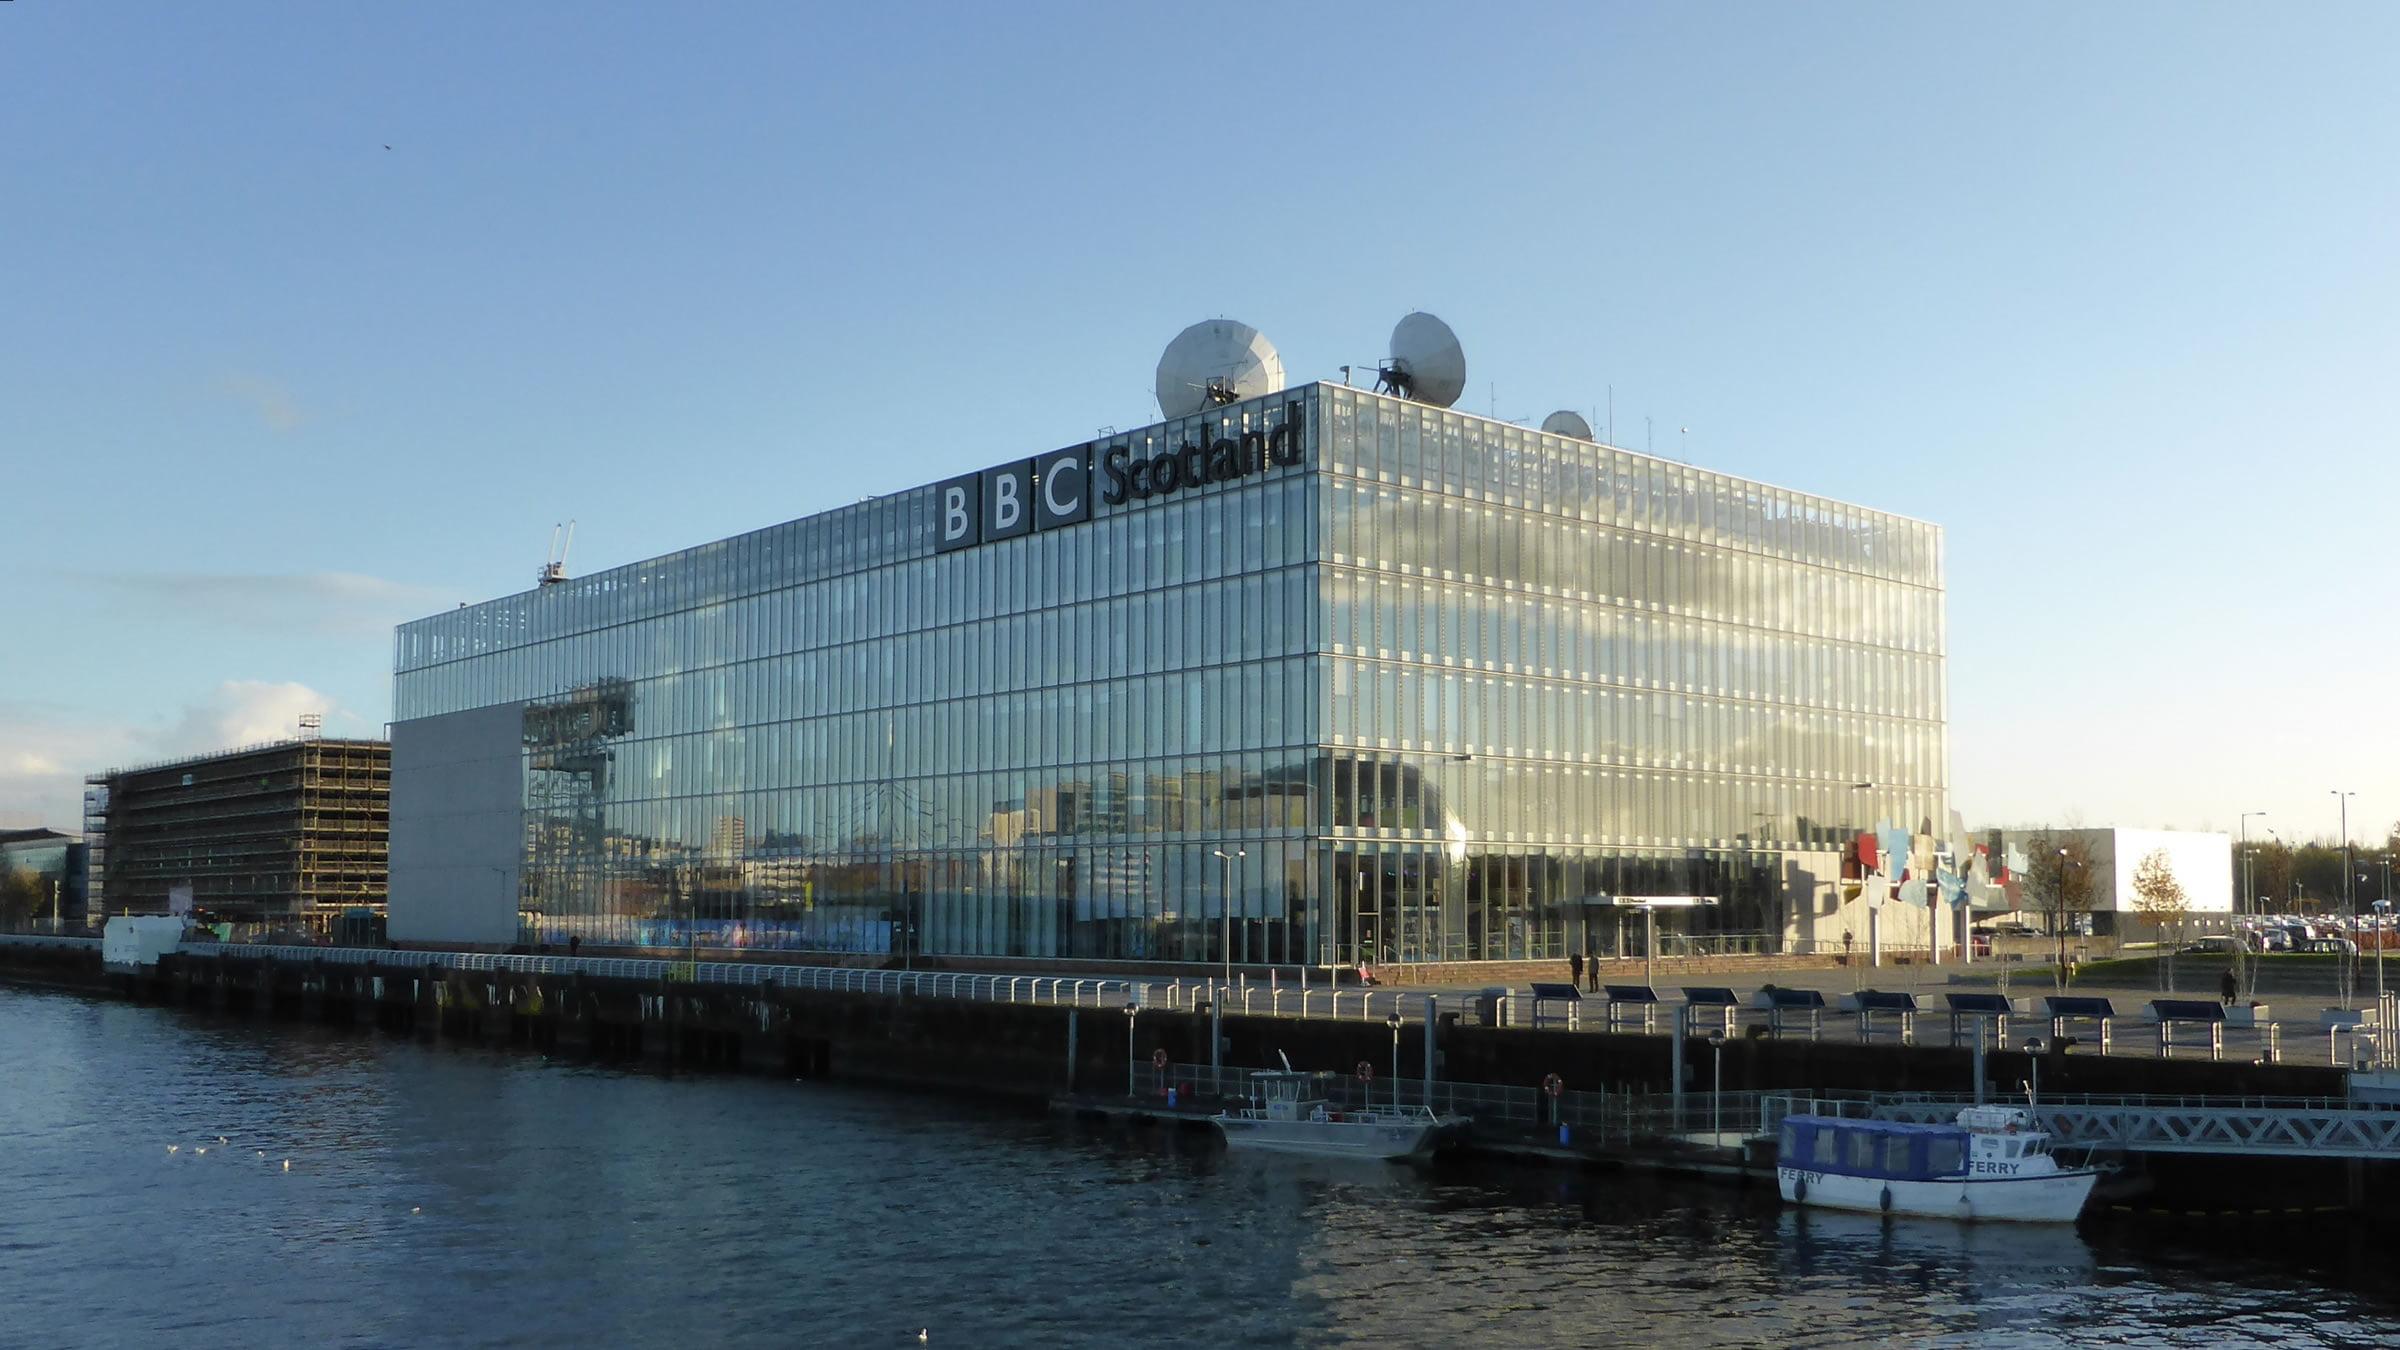 bbc scotland - photo #20